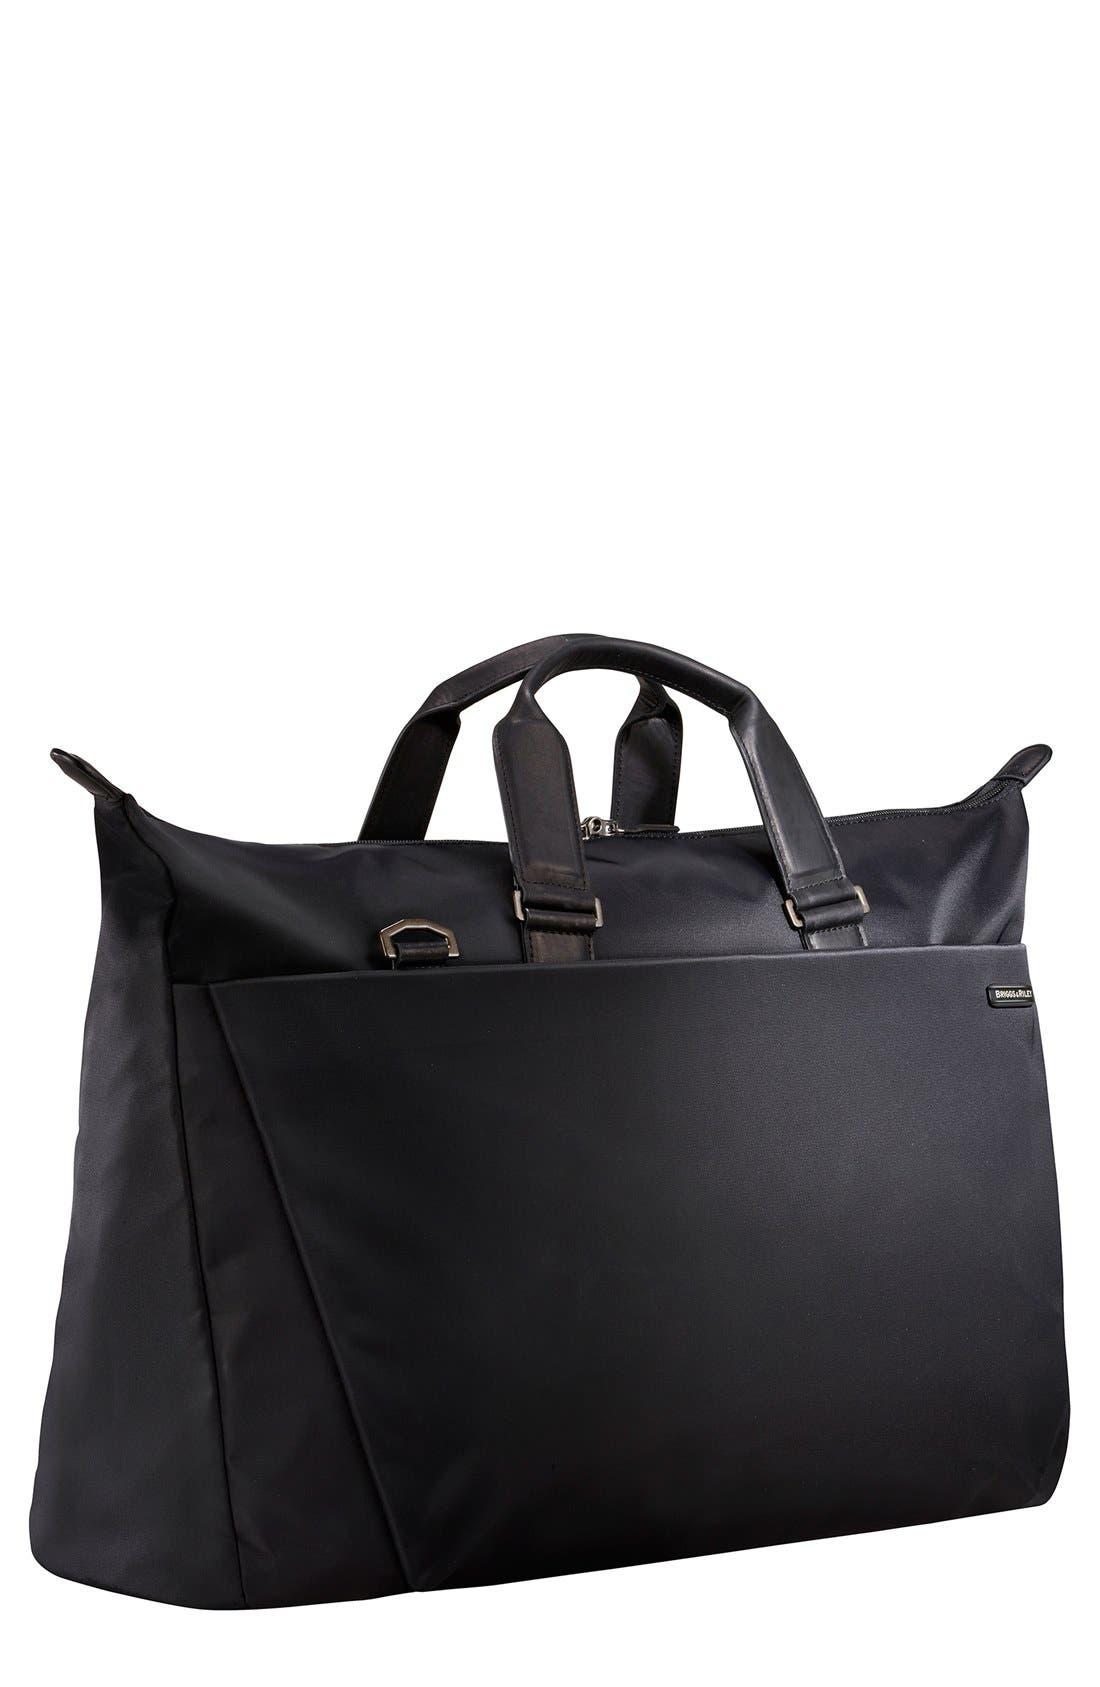 Main Image - Briggs & Riley Sympatico 22-Inch Duffel Bag